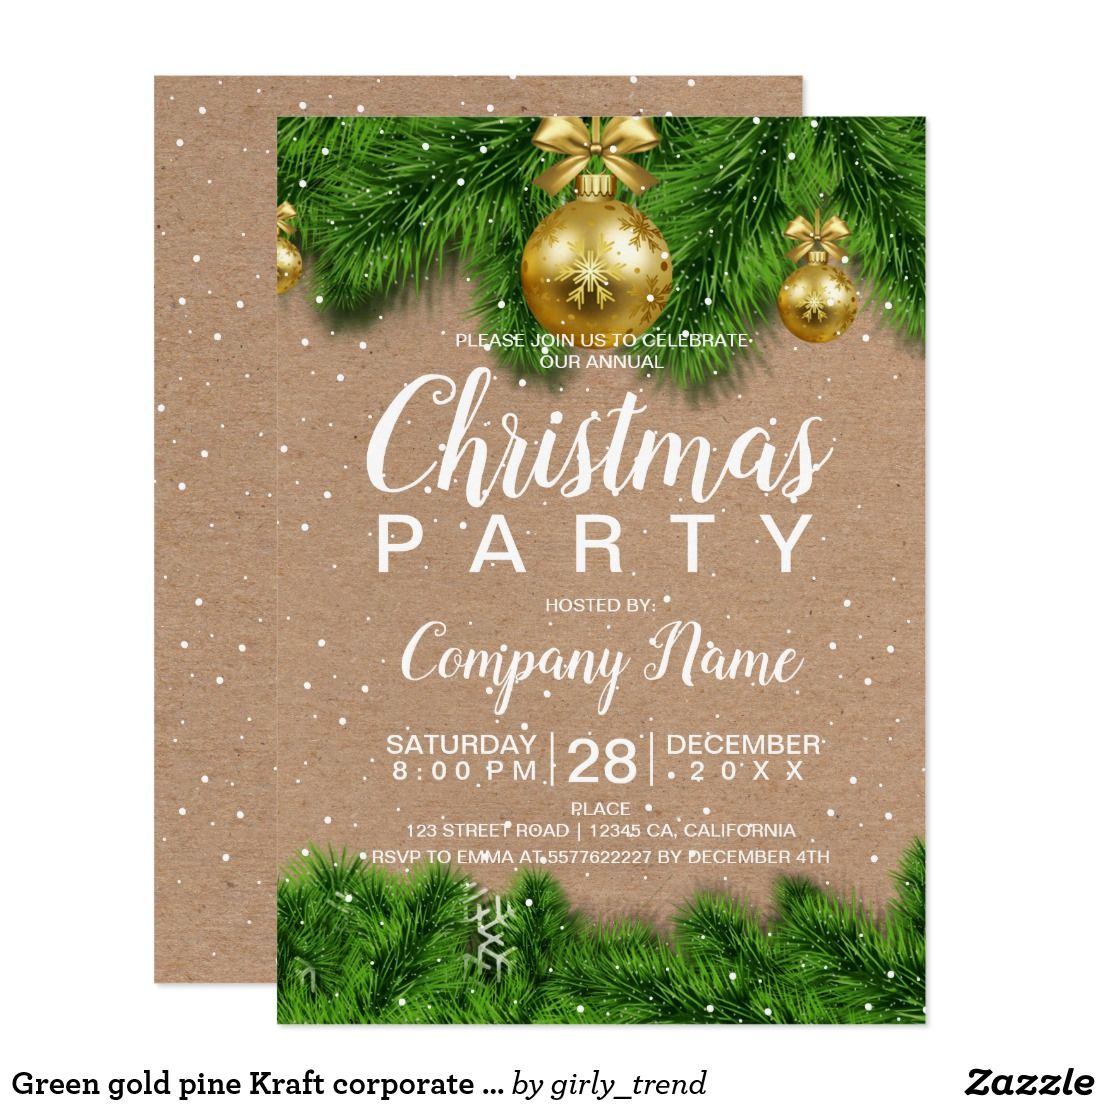 Green gold pine Kraft corporate Christmas Invitation | Pinterest ...